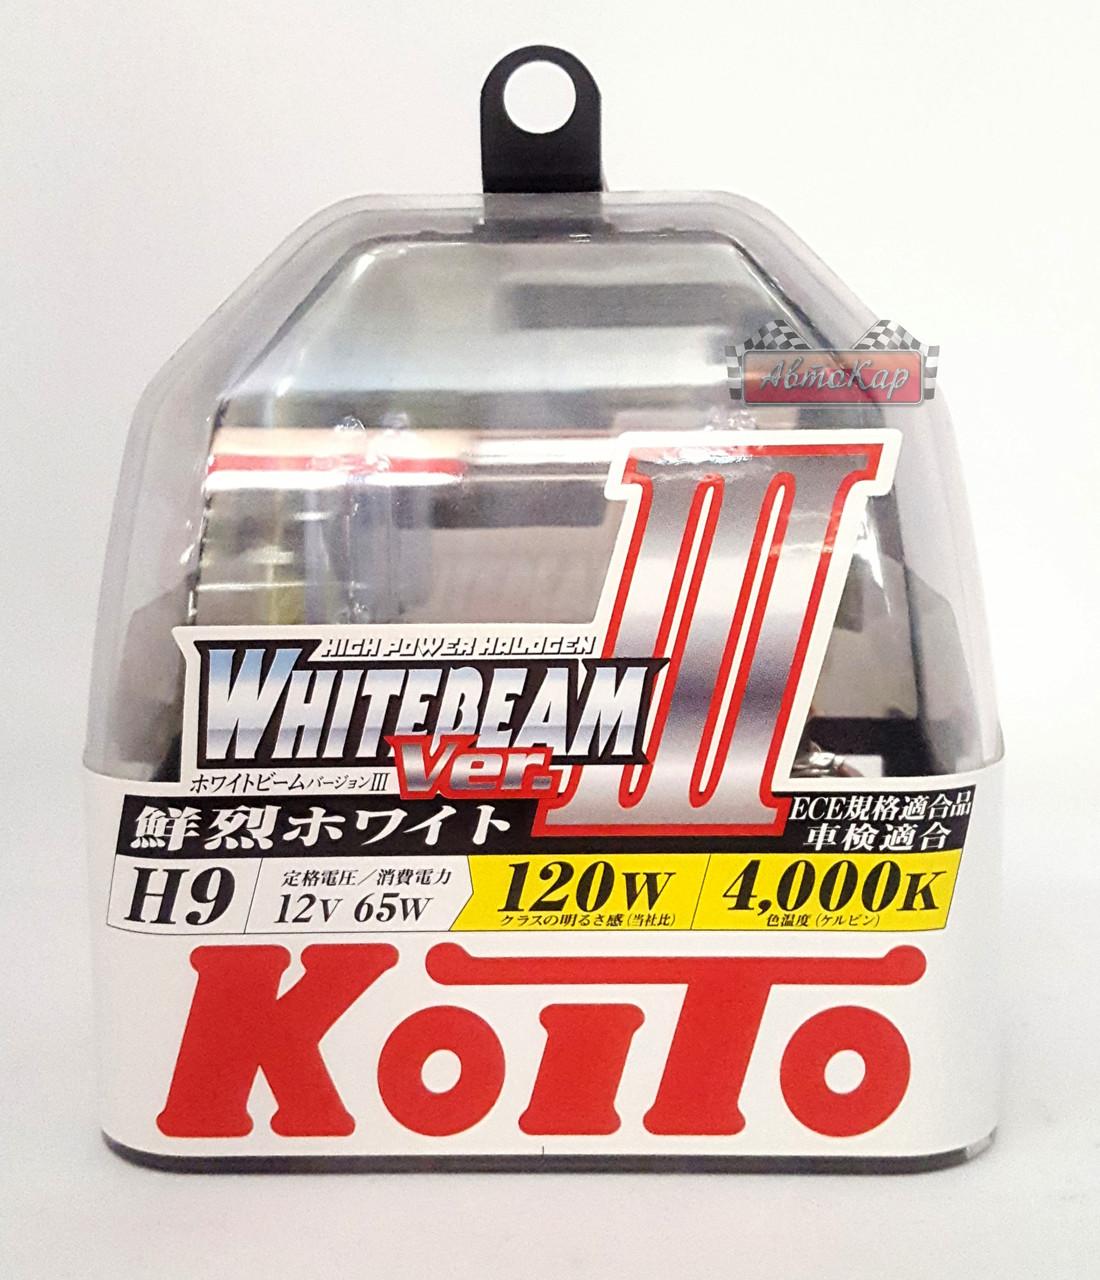 Автолампы Koito WhiteBeam III, 4000K , H9, 2шт., P0759W - Автокар в Киеве